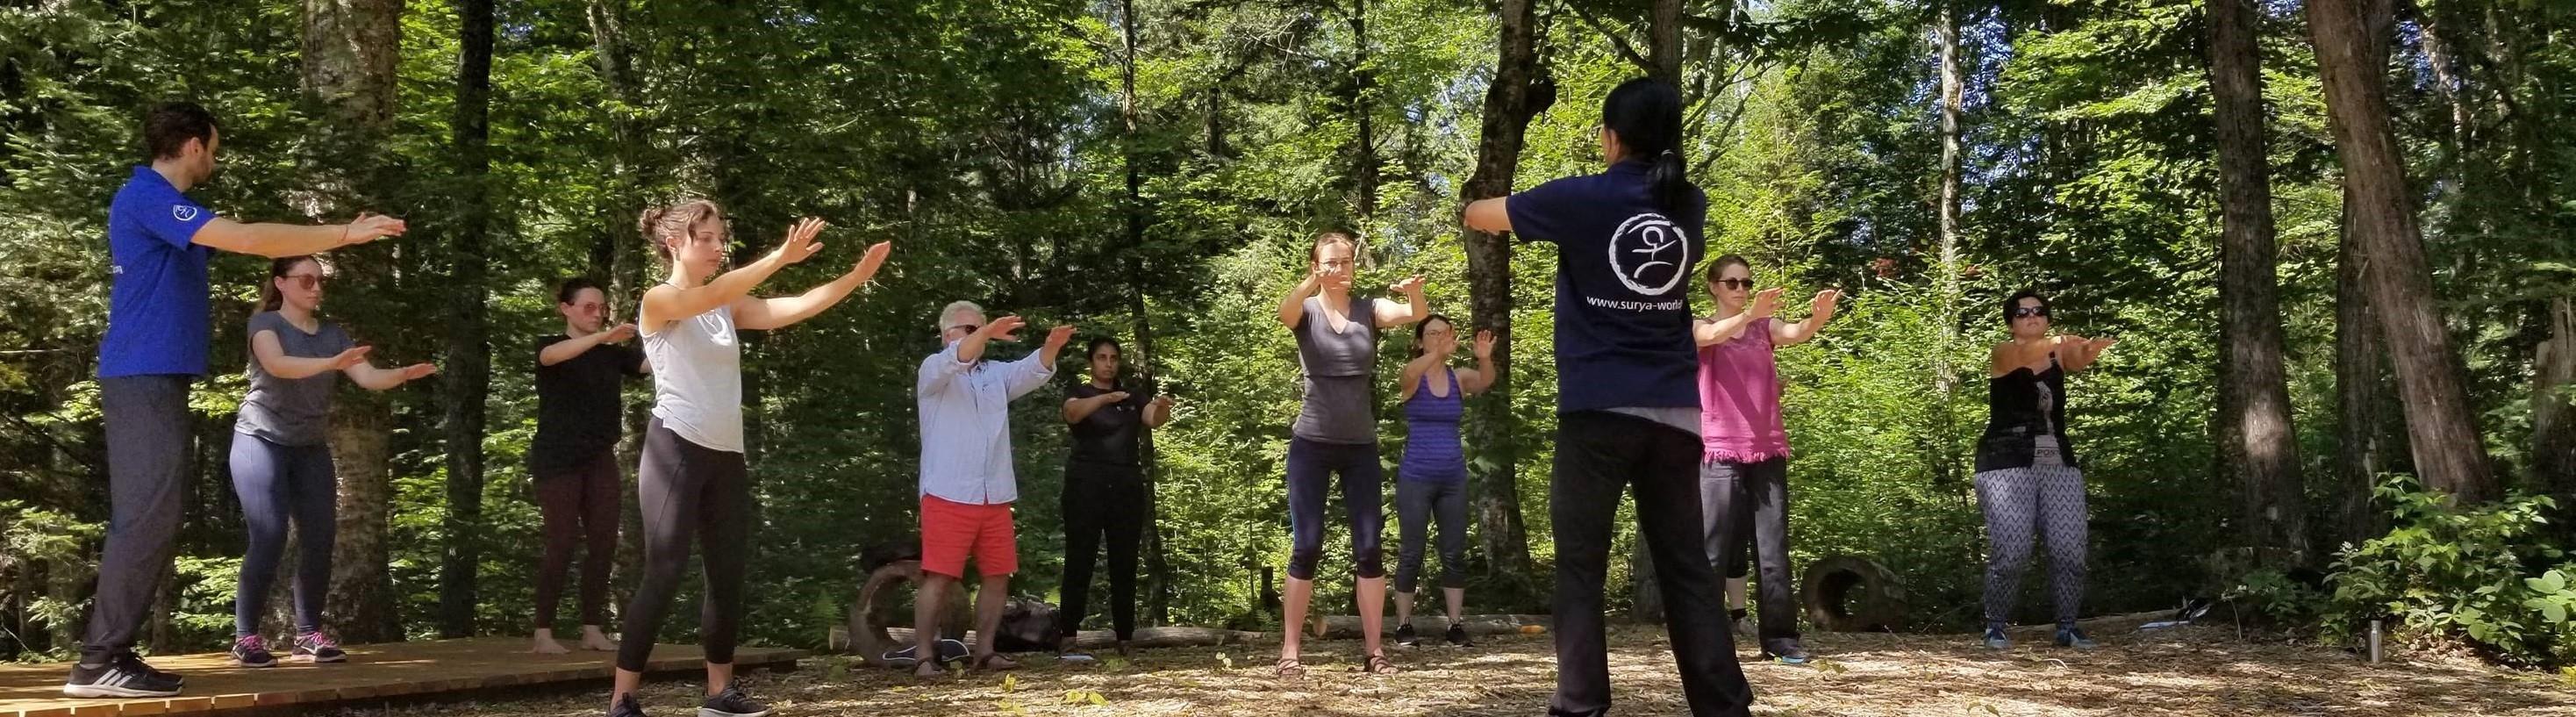 Quebec:  Retreat - Yoga and Ecology